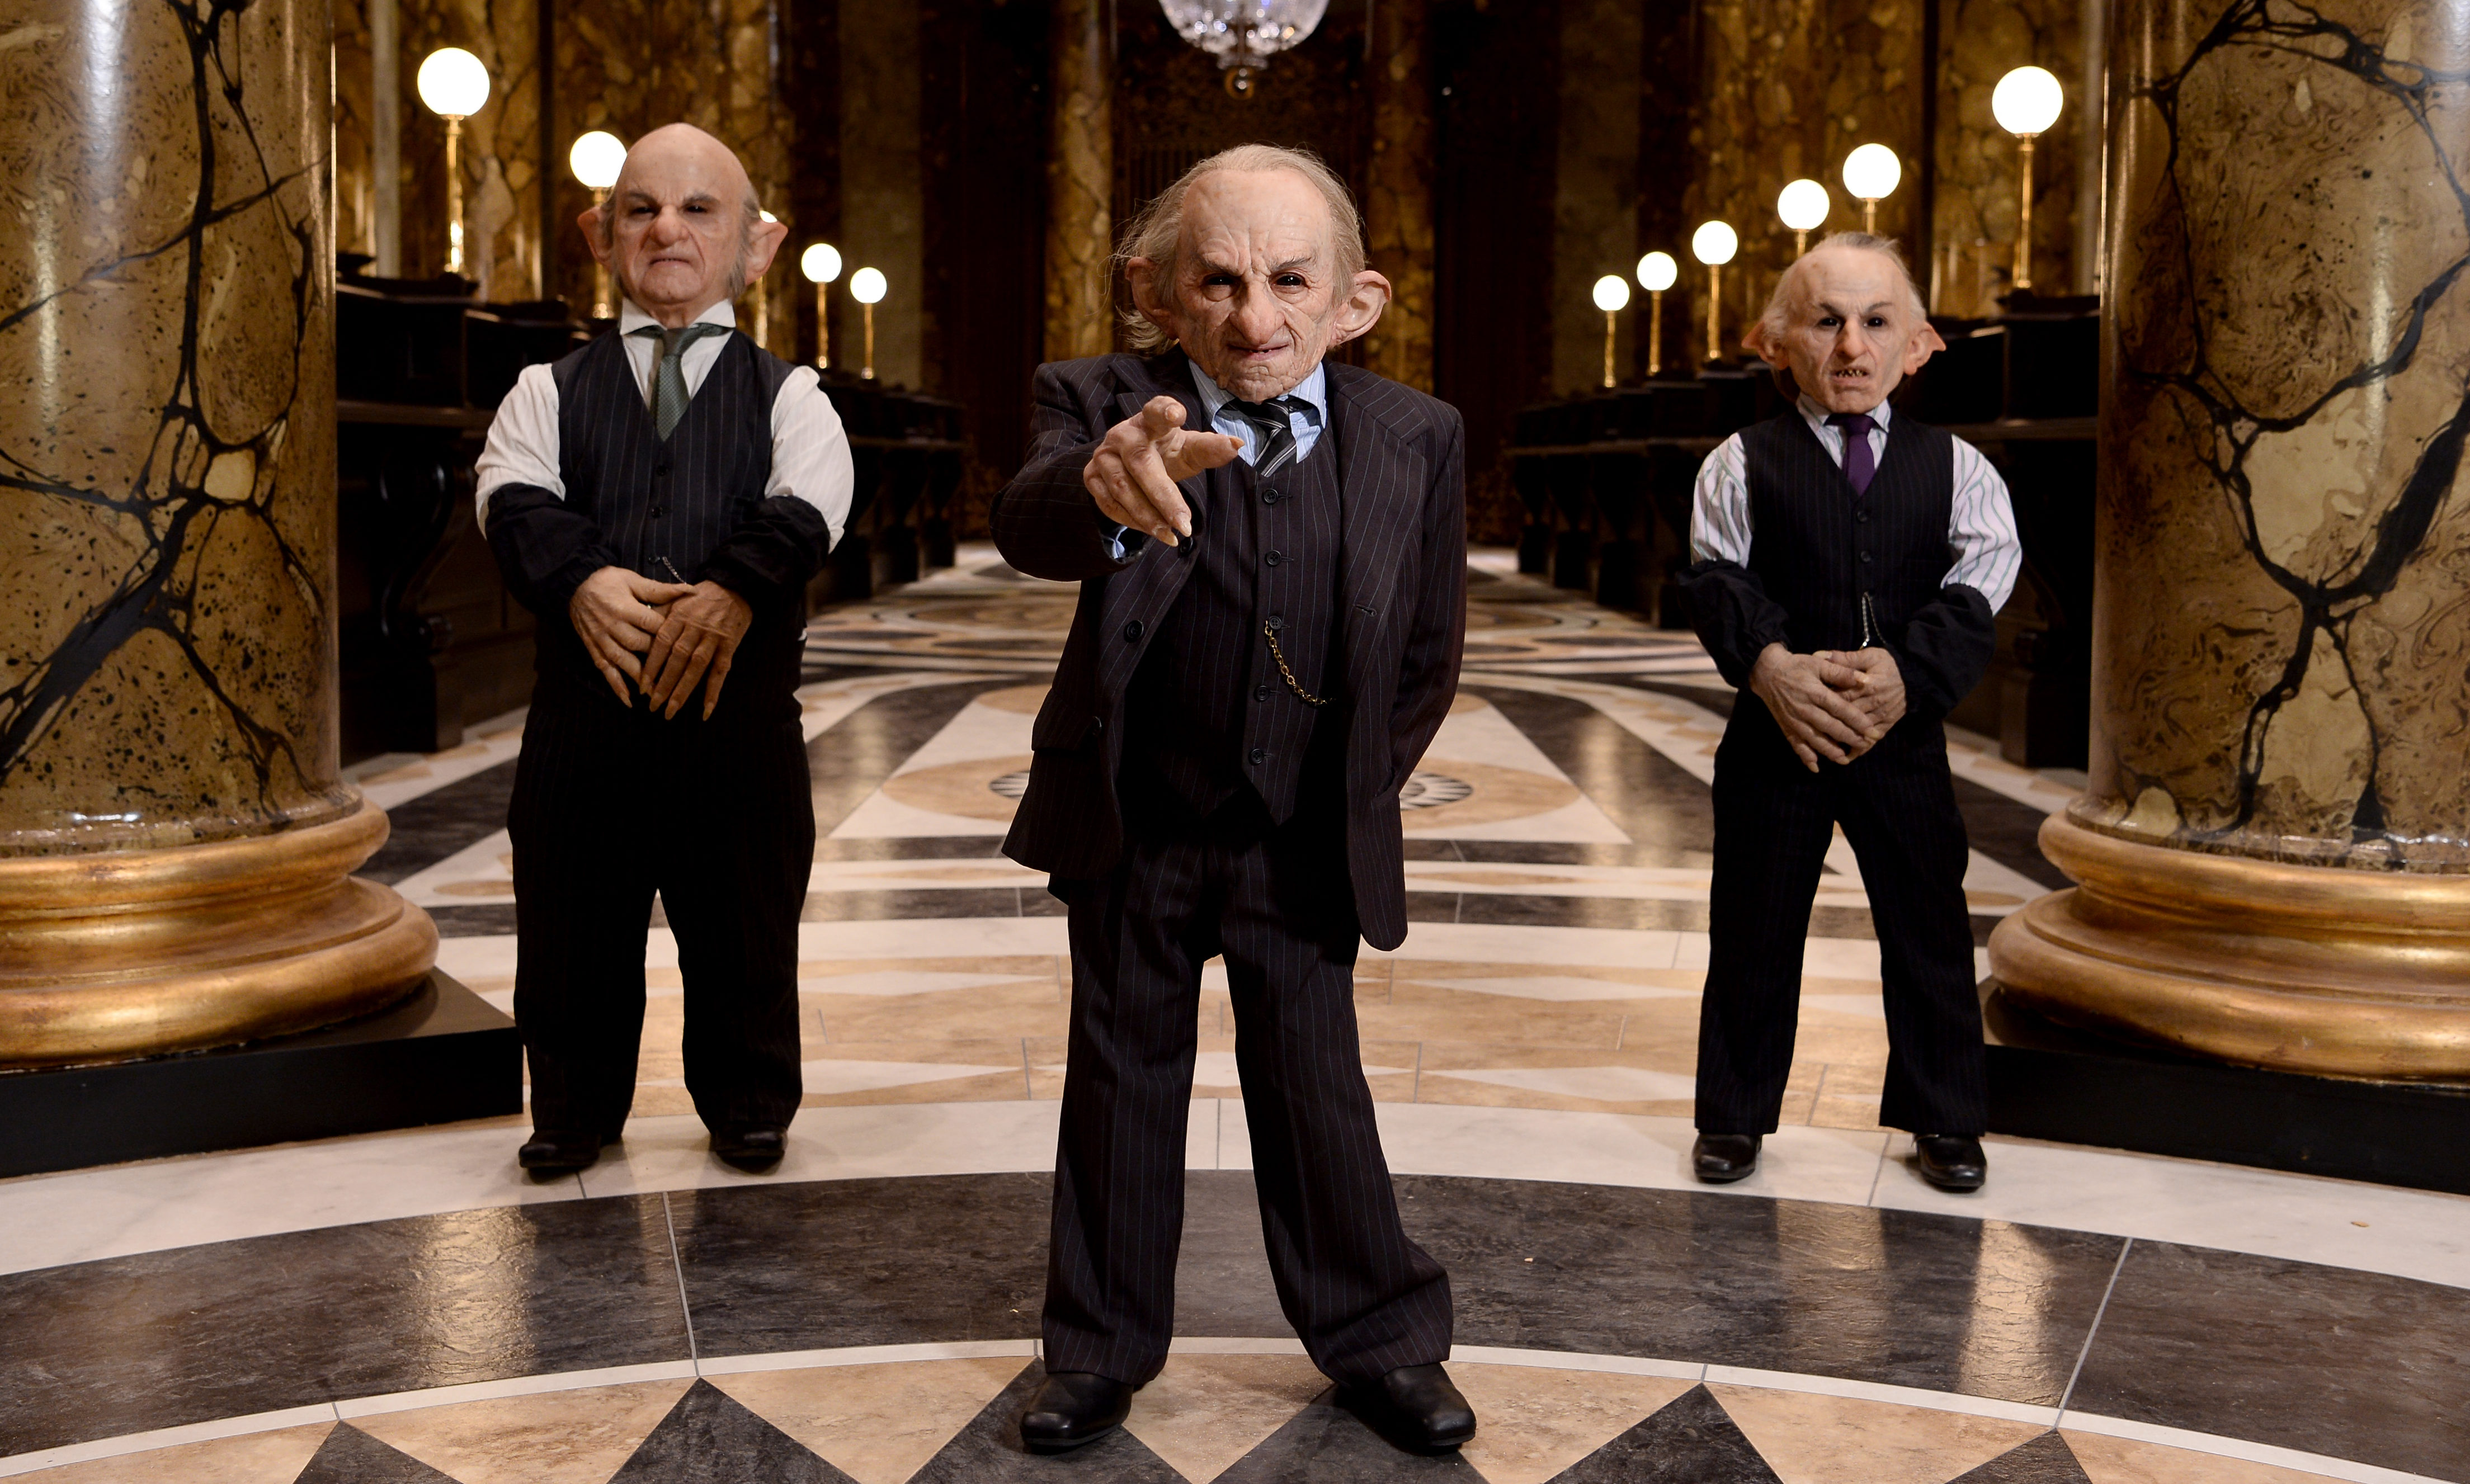 Goblins in the original Gringotts Wizarding Bank set at Warner Bros protect the vaults.